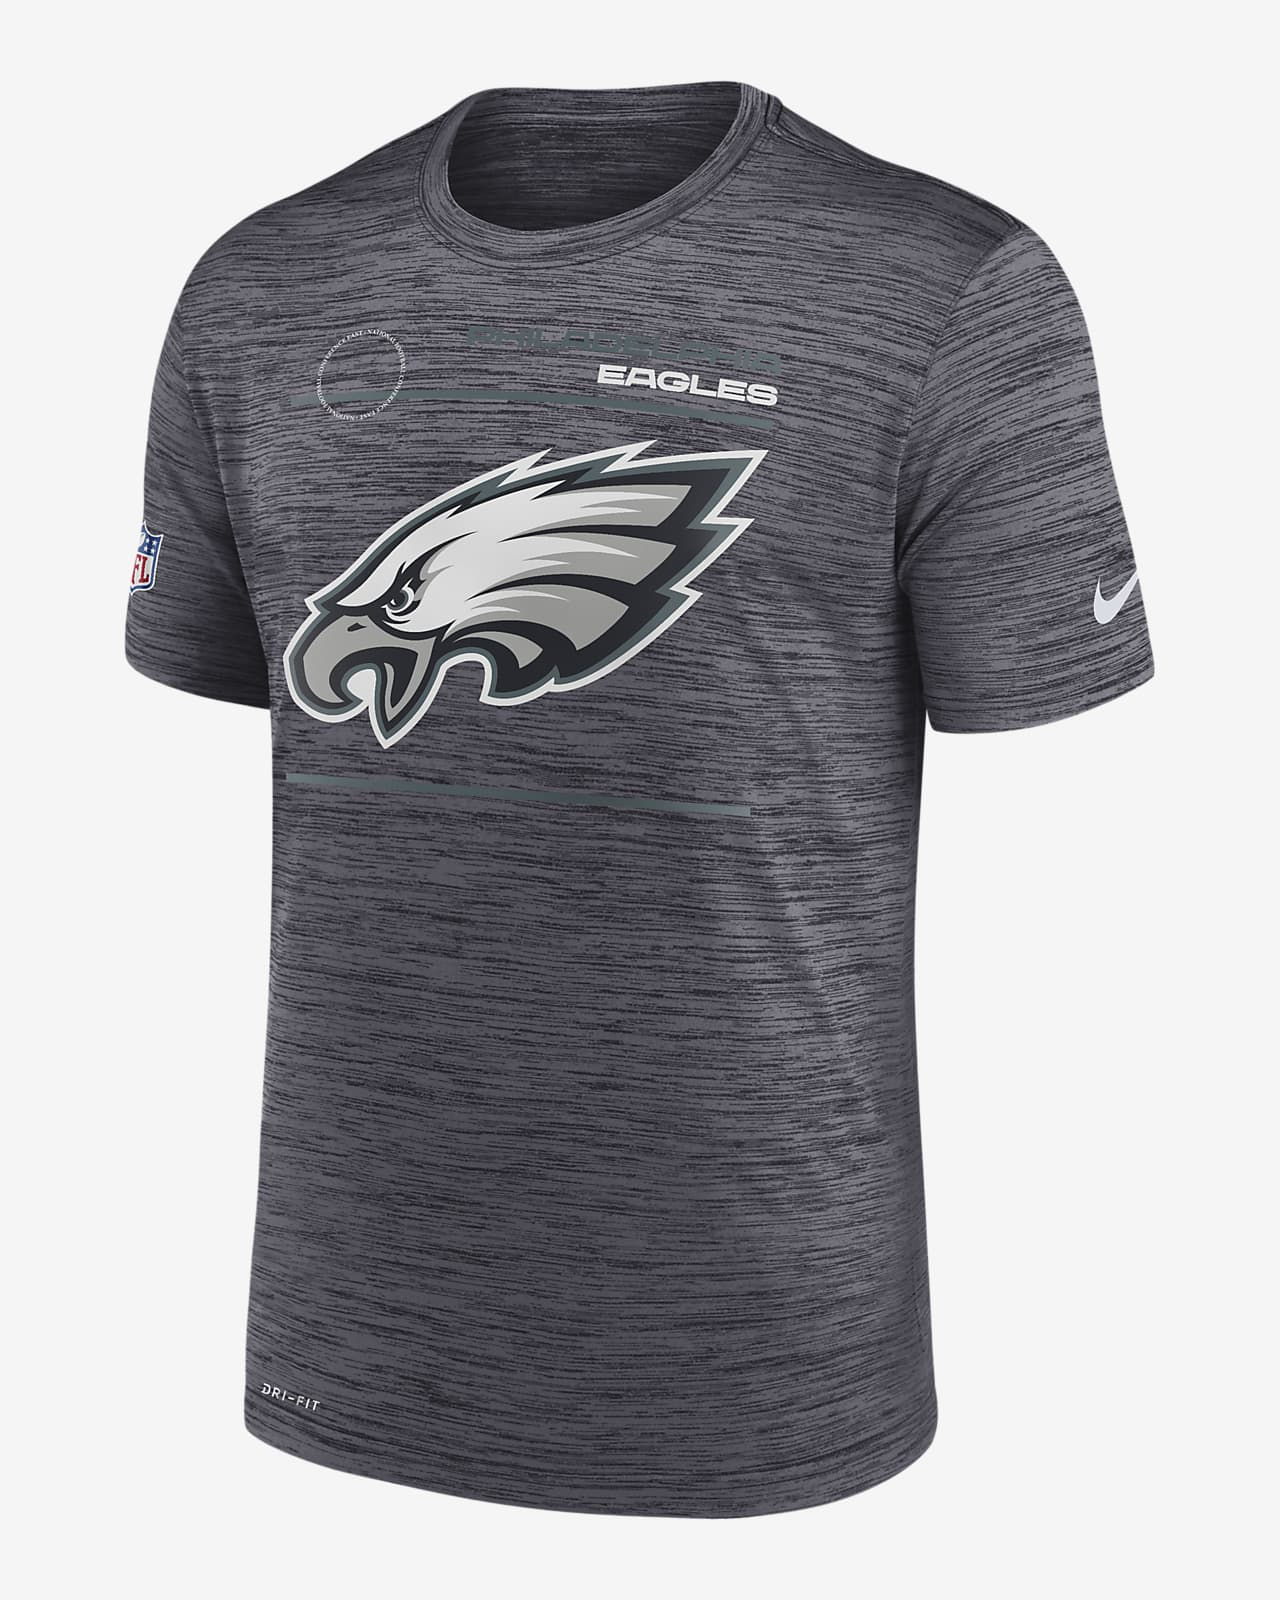 Nike Dri-FIT Sideline Velocity Legend (NFL Philadelphia Eagles) Men's T-Shirt